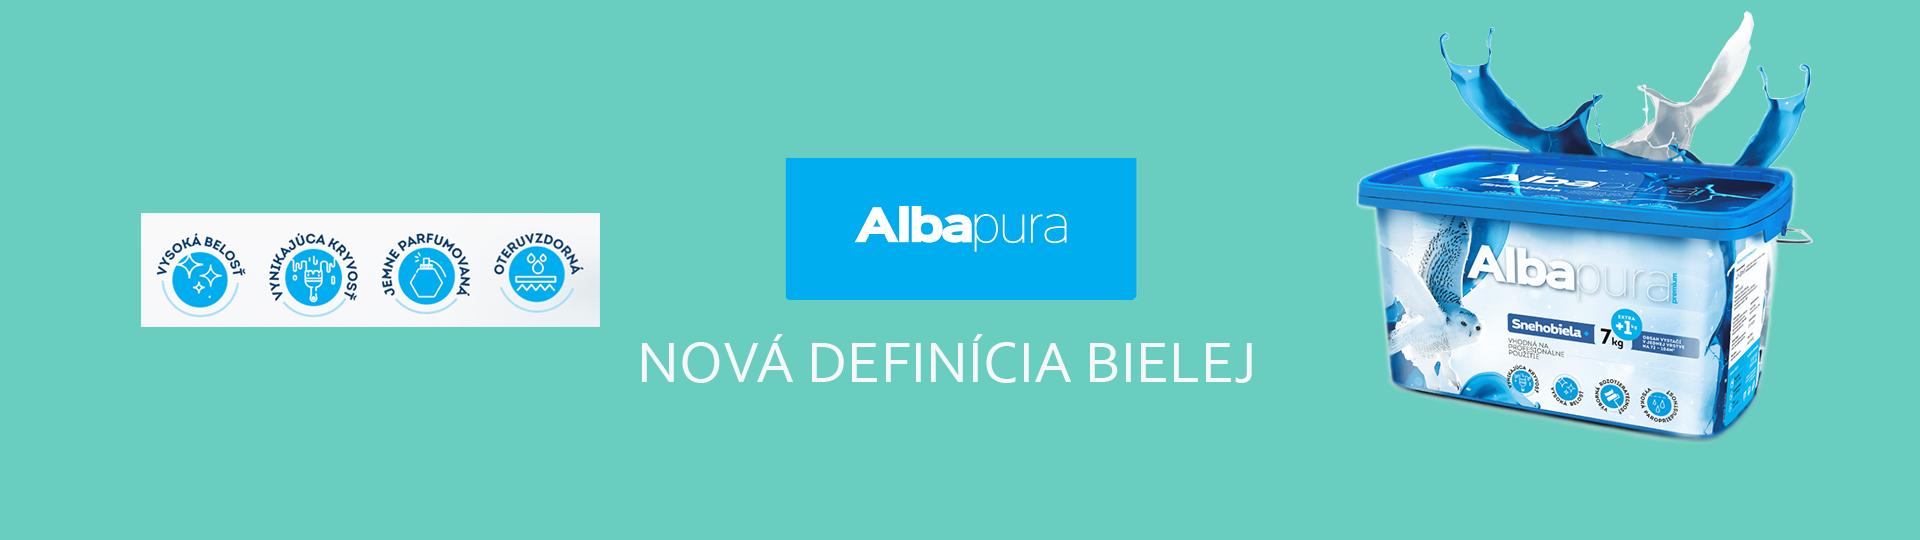 albapura